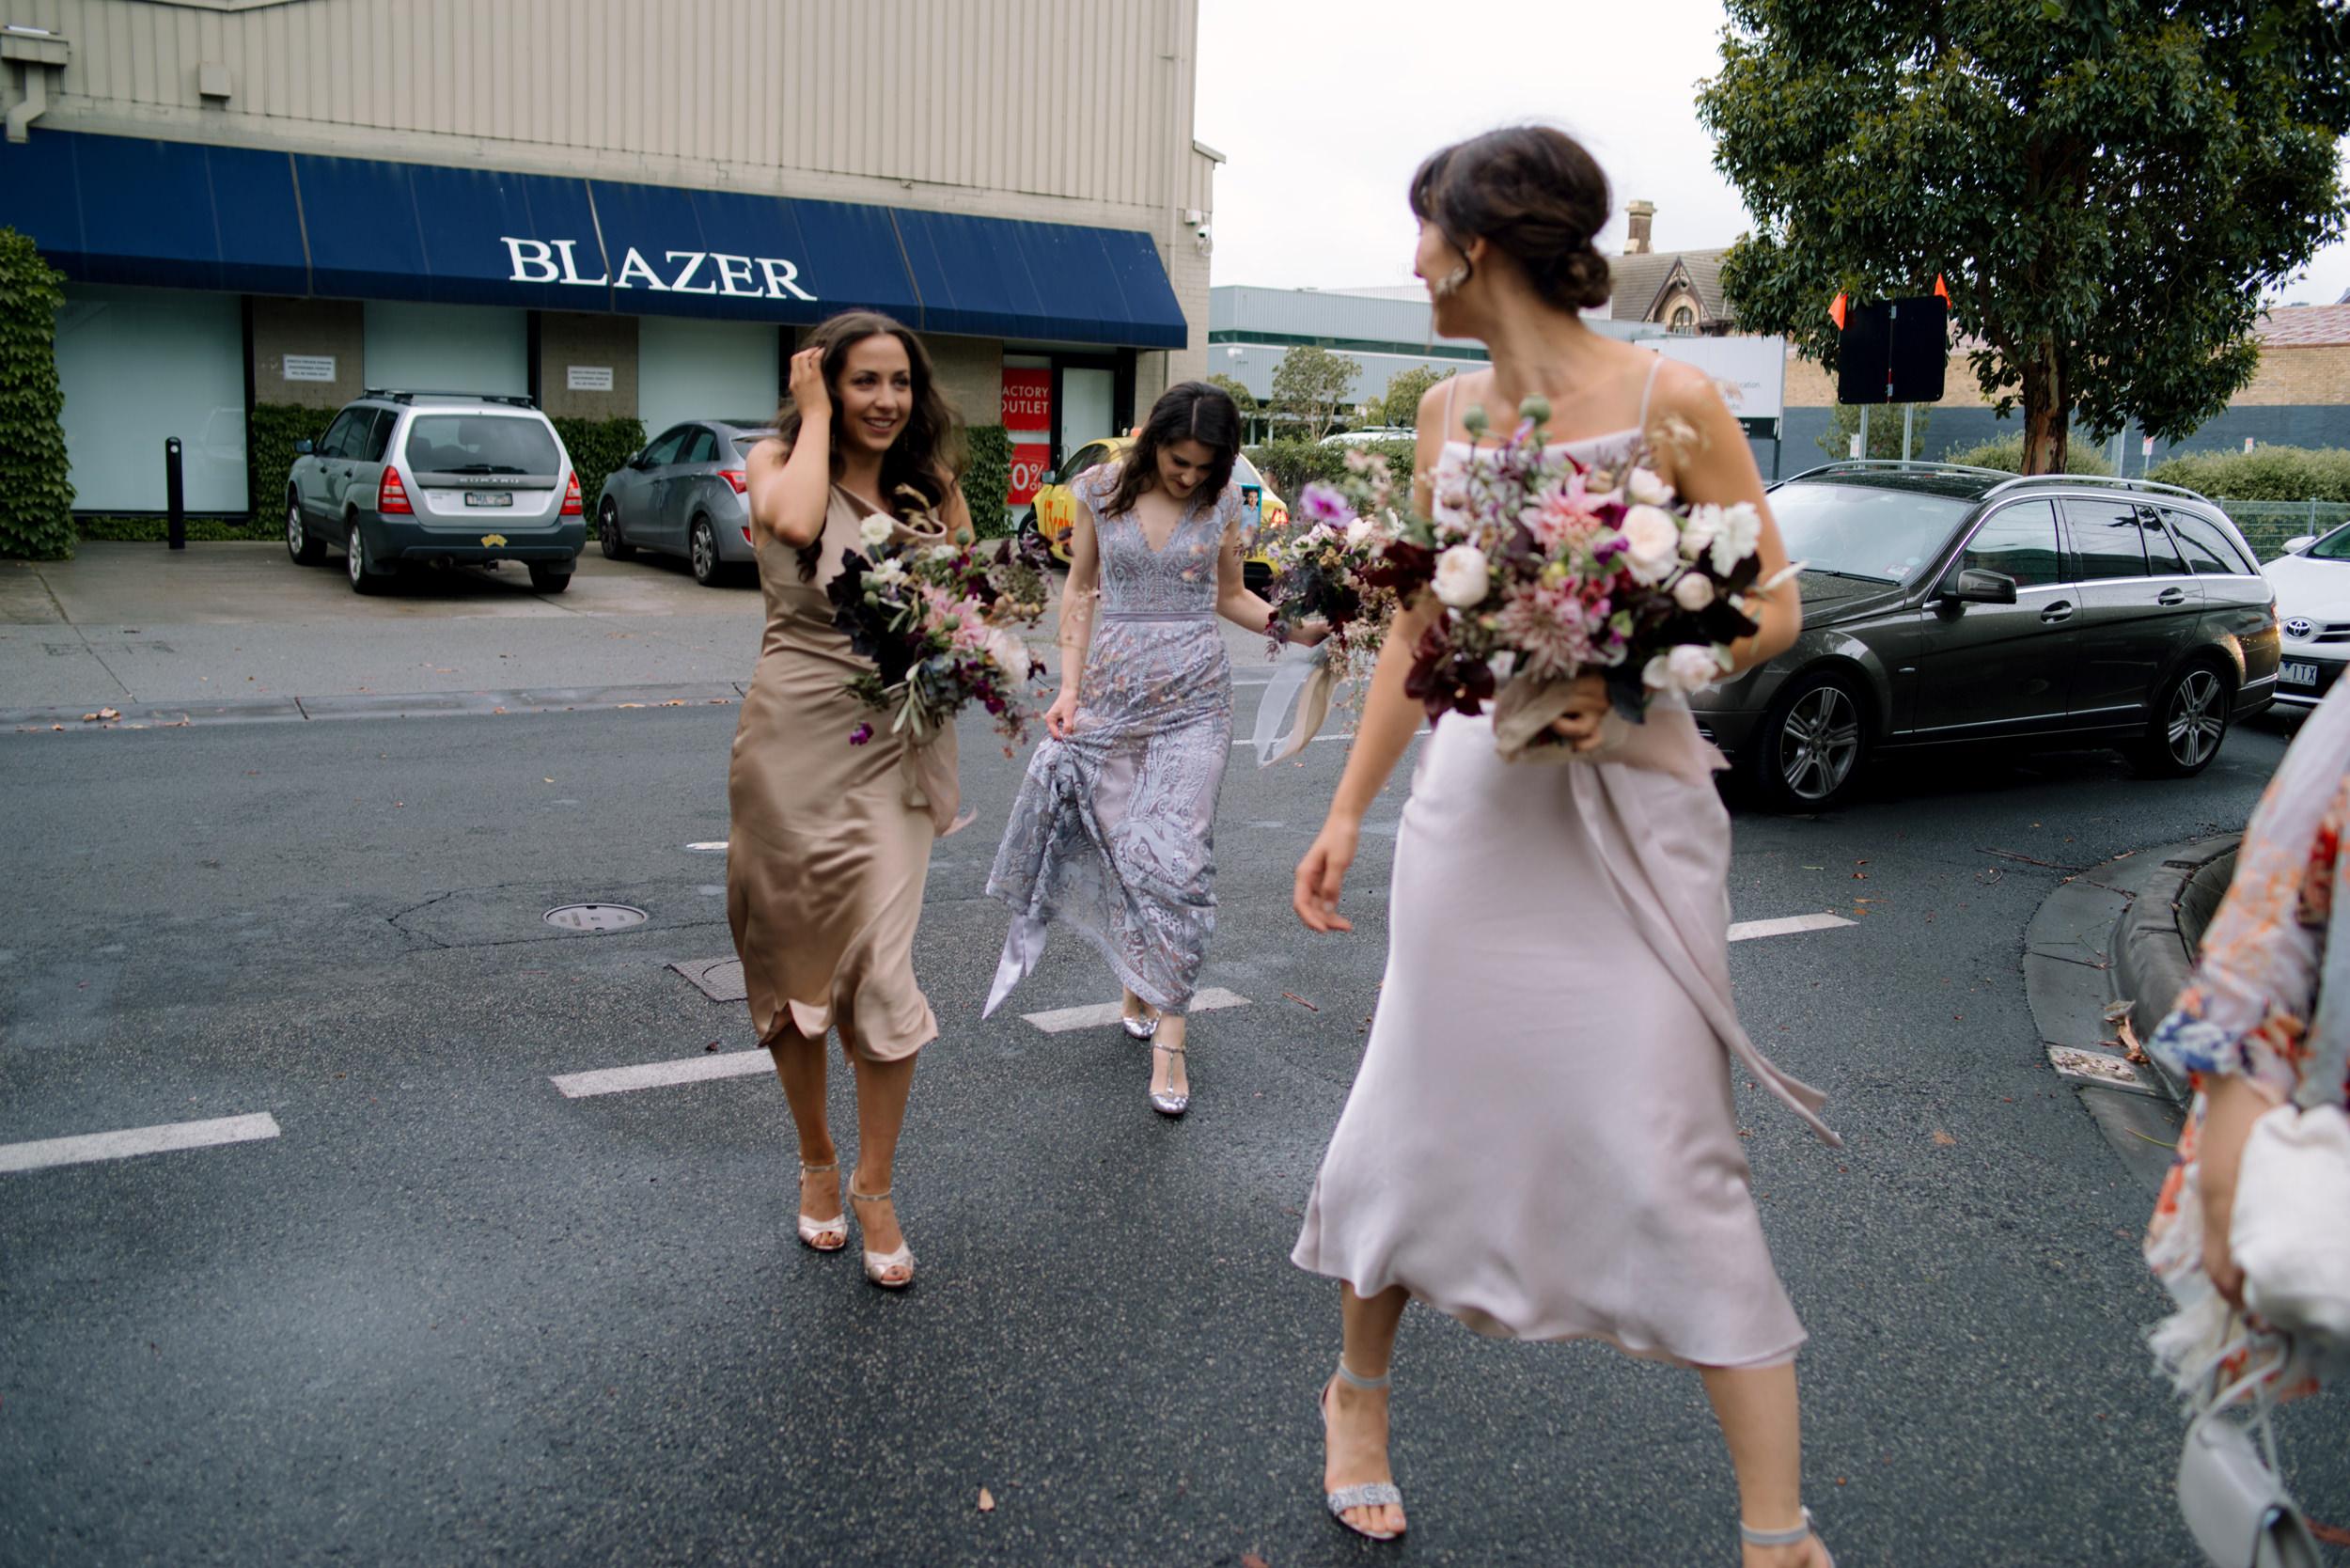 I-Got-You-Babe-&.Co.-Glasshaus-Wedding-Charlotte-Cameron0053.JPG